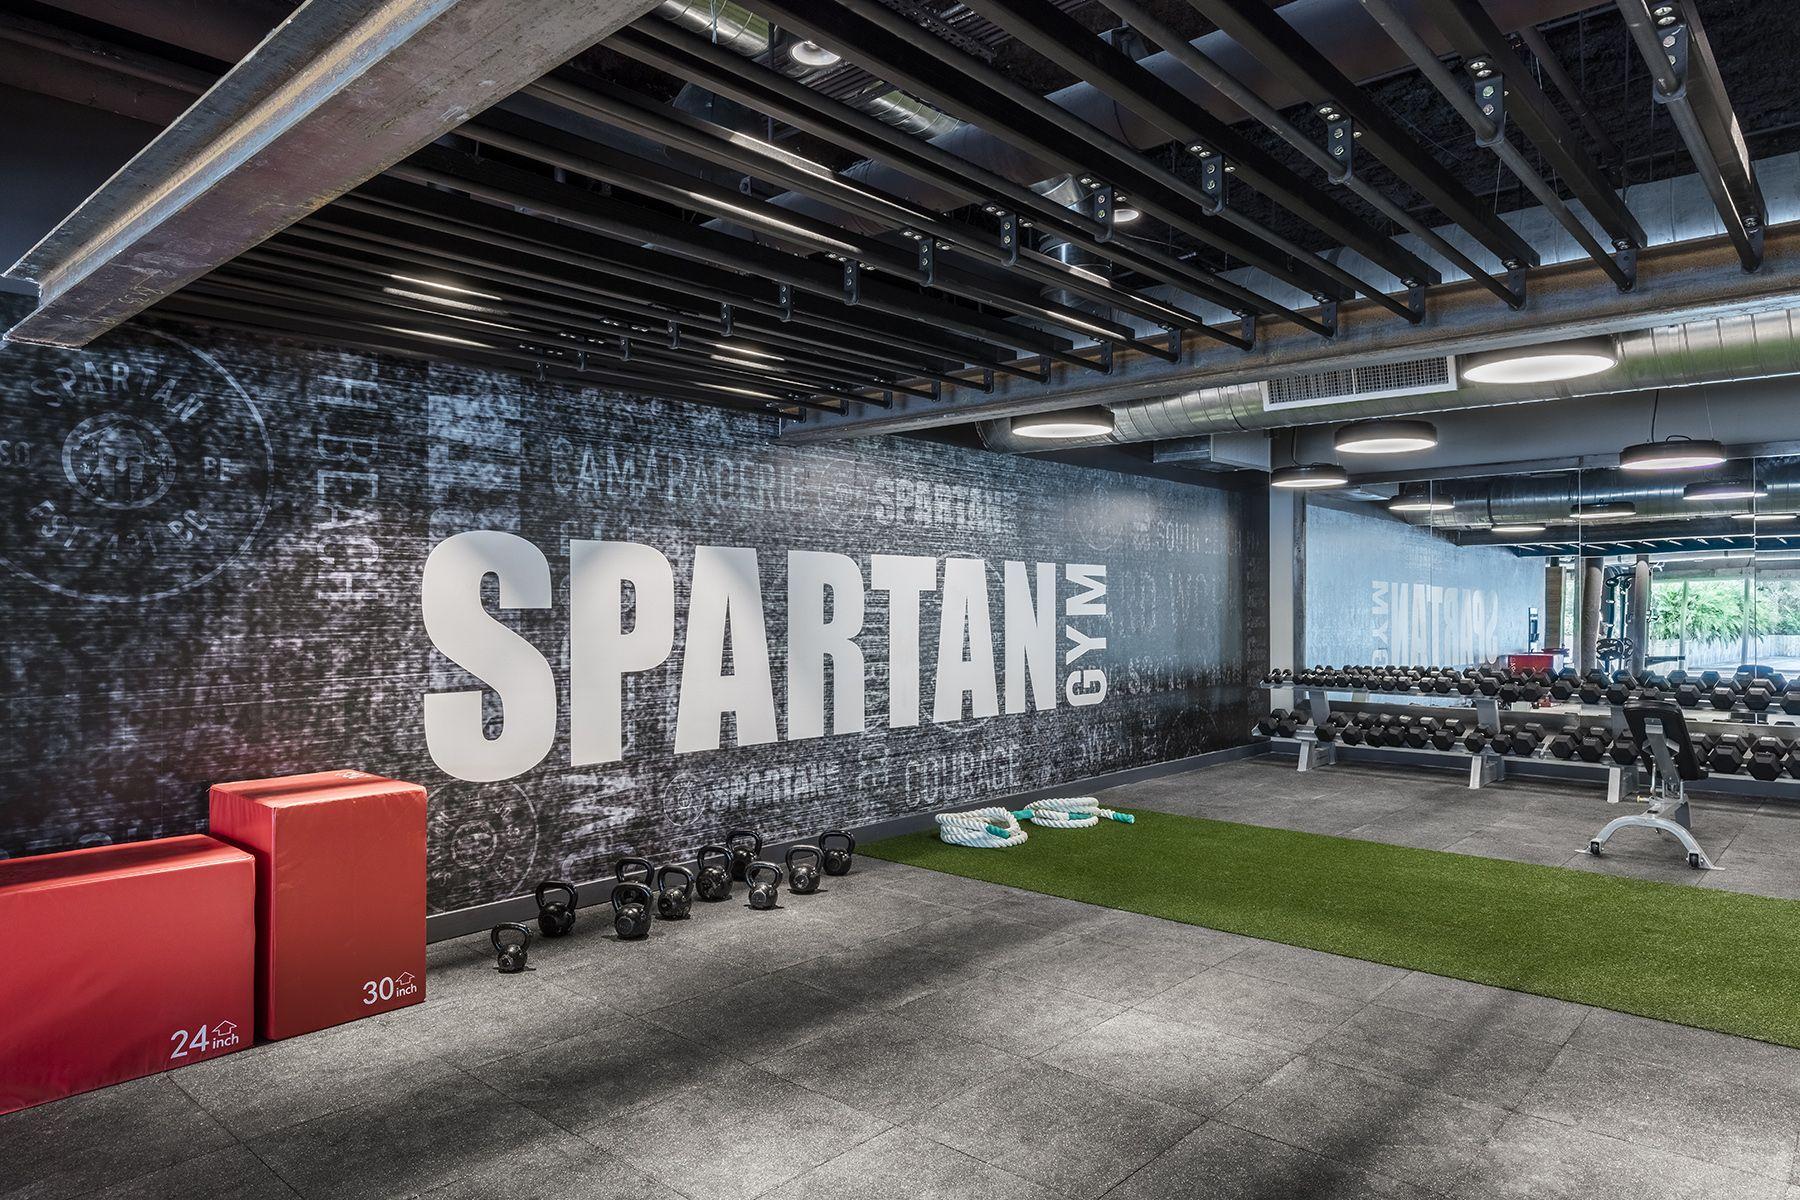 Tour hotel south beach s new spartan gym hyattsville rustic